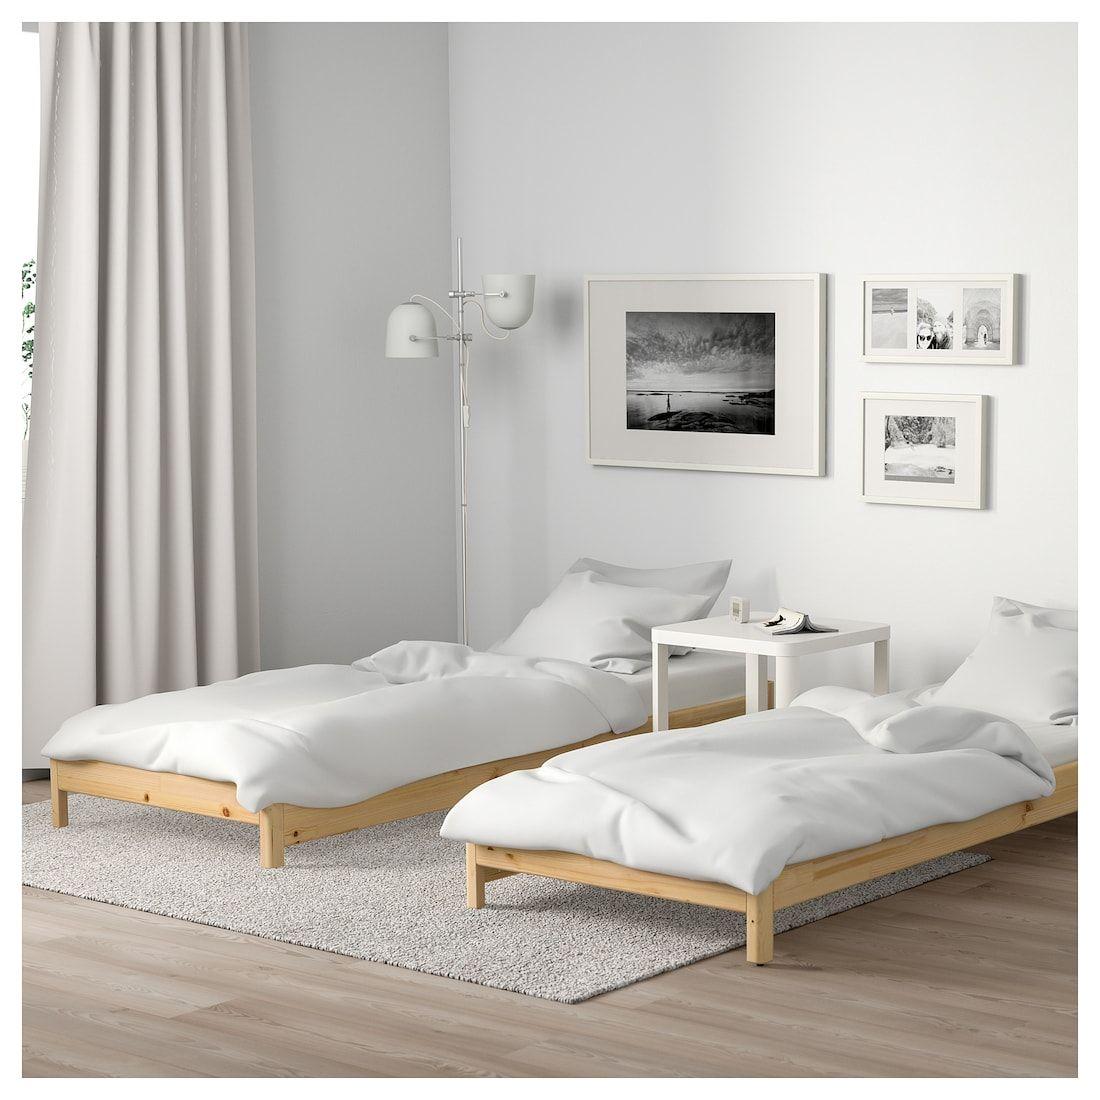 Utaker Stackable Bed Pine Twin Ikea Small Room Design Furniture Ikea Bed